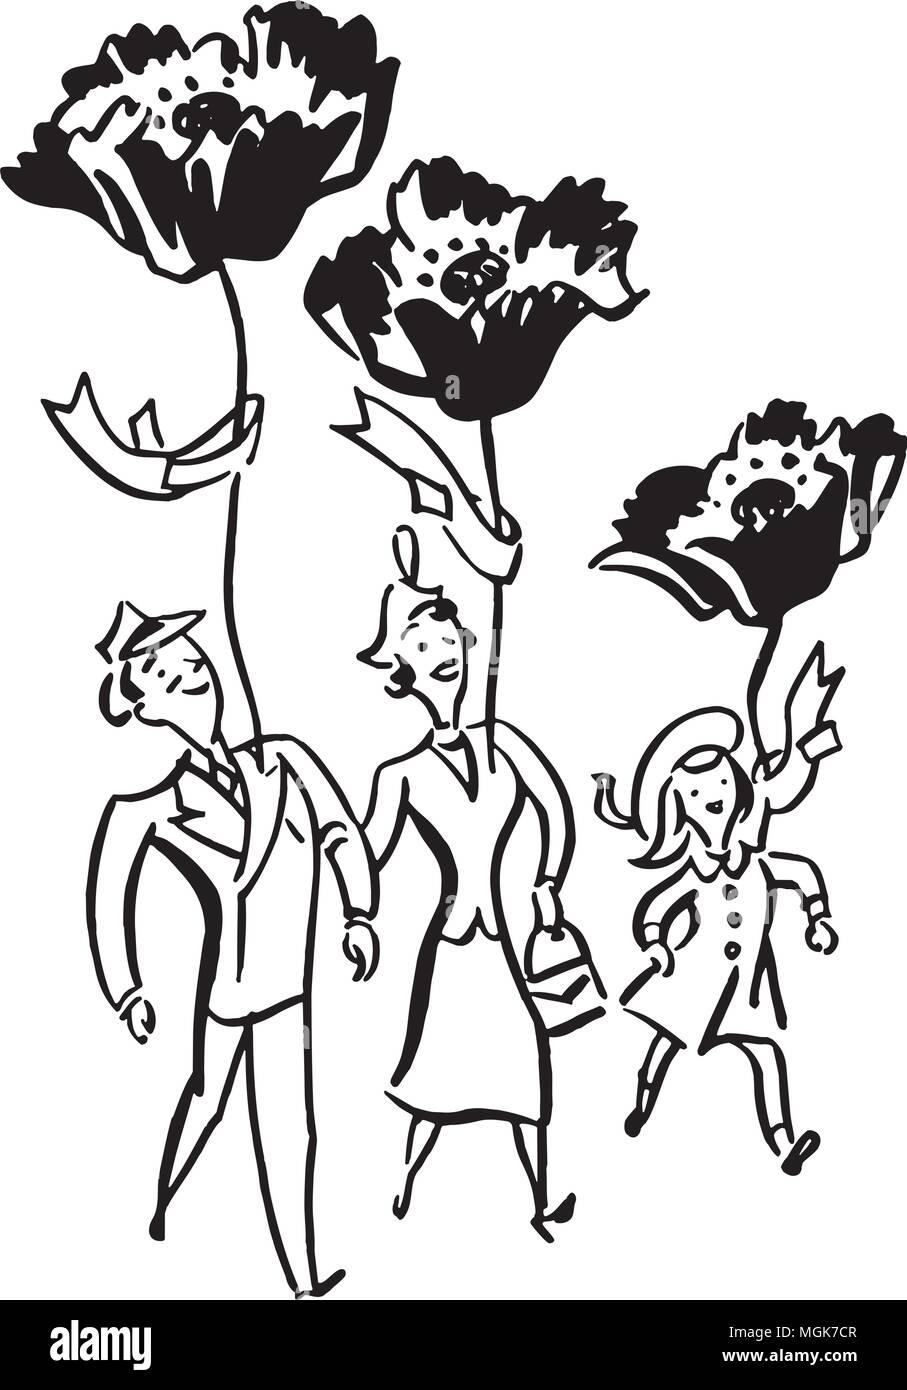 Support Poppy Day - Retro Clipart Illustration - Stock Vector